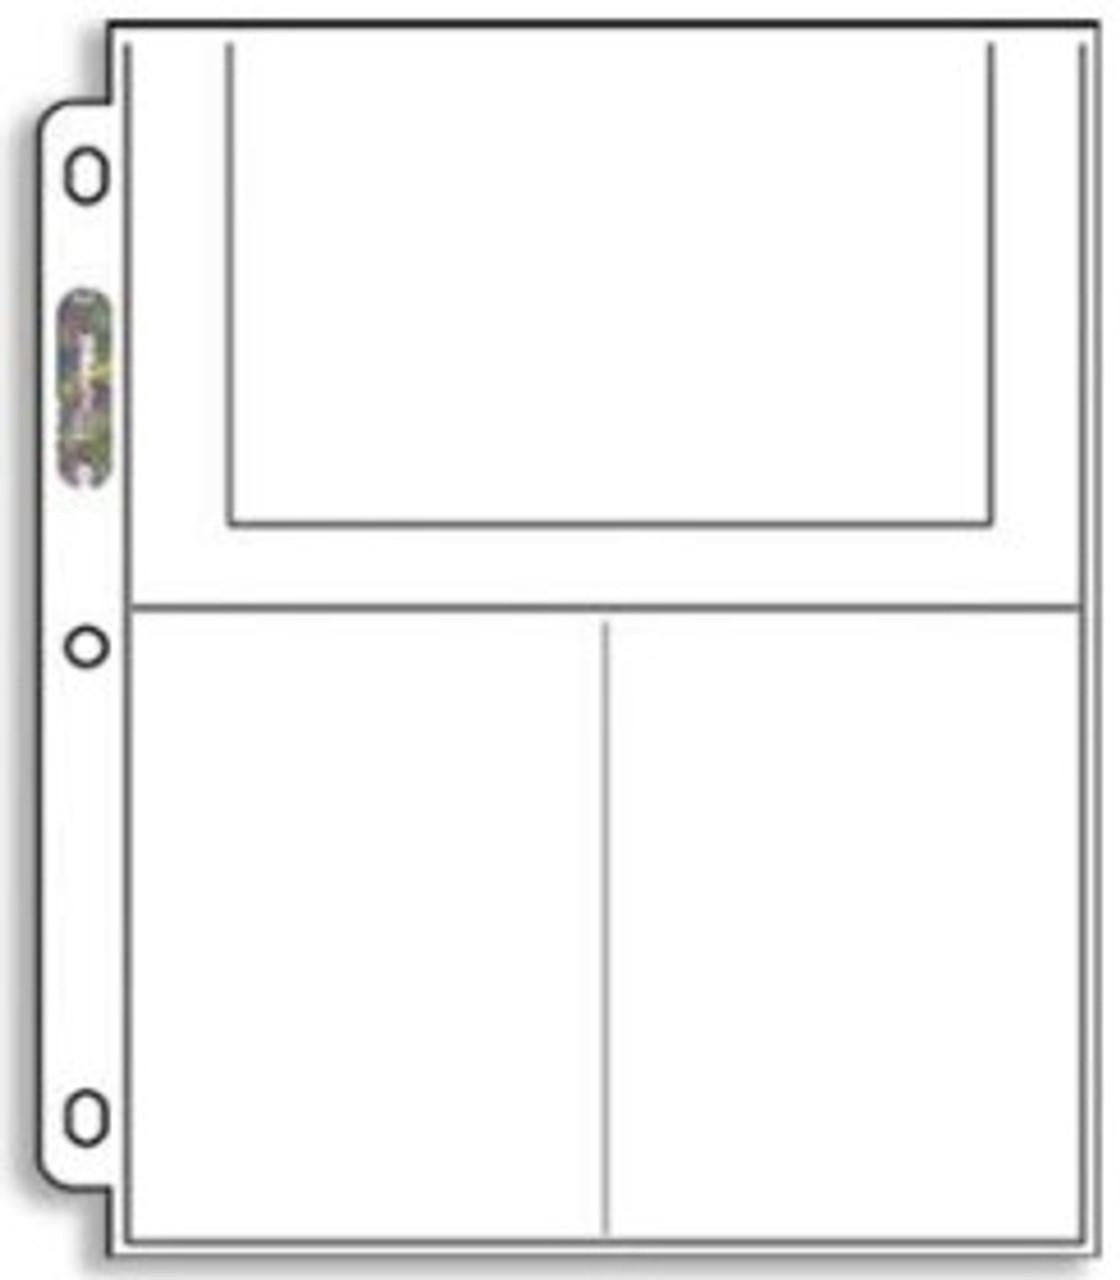 Ultra Pro 3-Pocket Postcard Pages 246D (100ct)